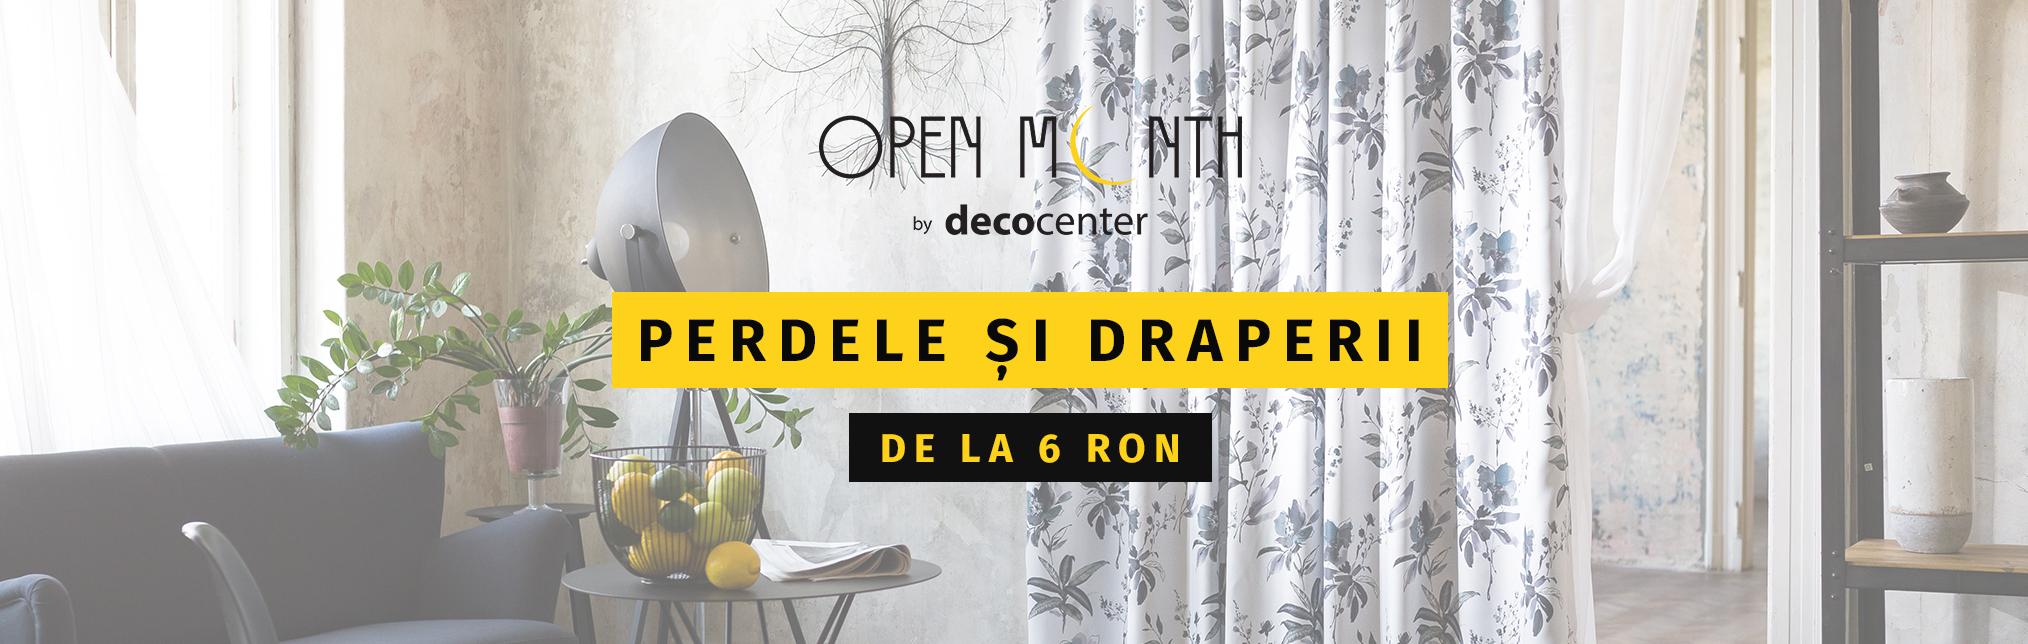 open m 1